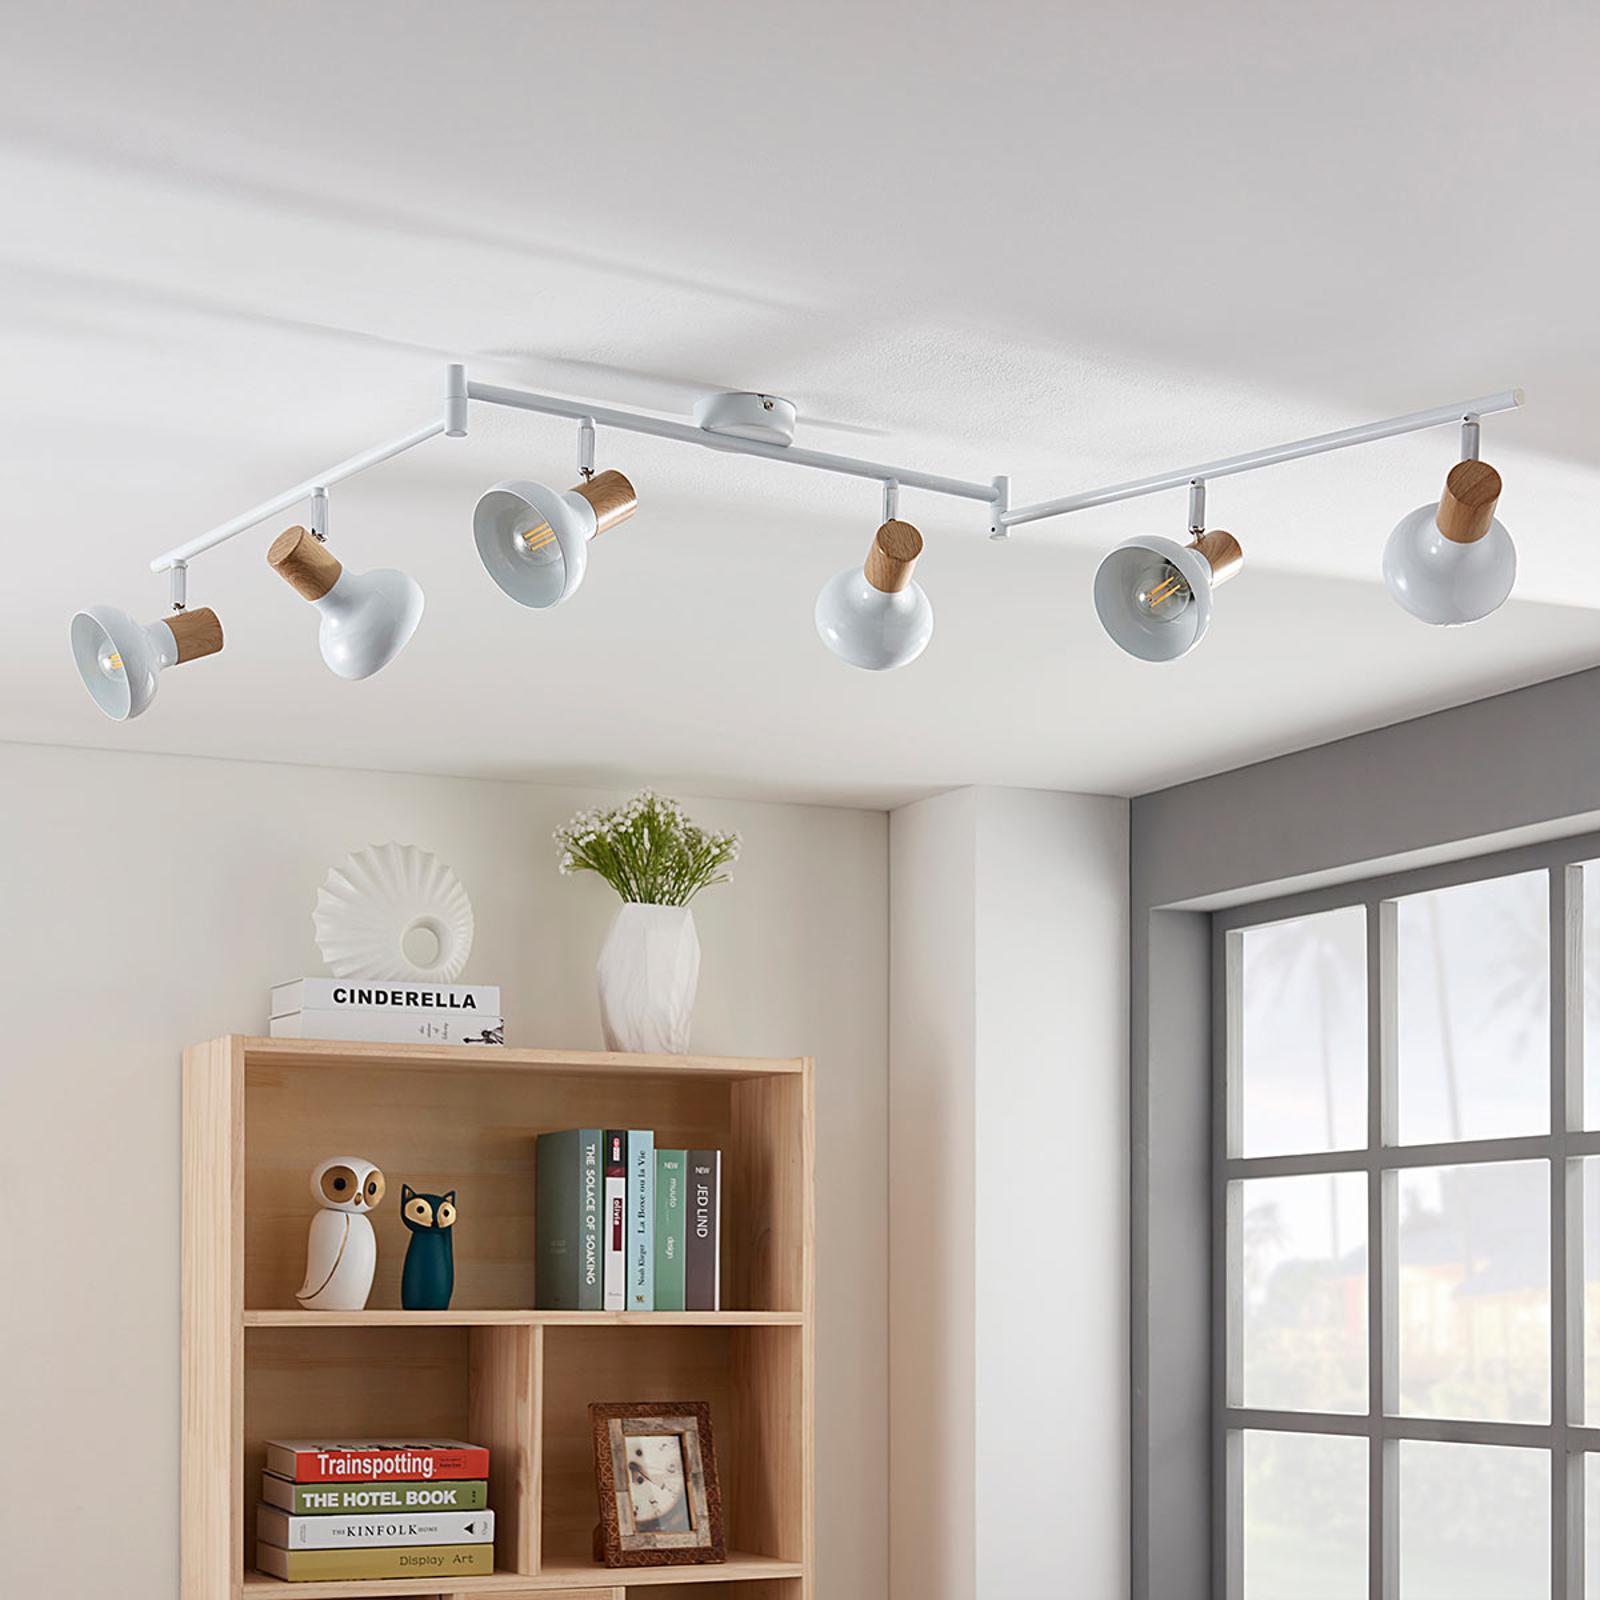 Plafondlamp Fridolin in wit metaal met twee lampen